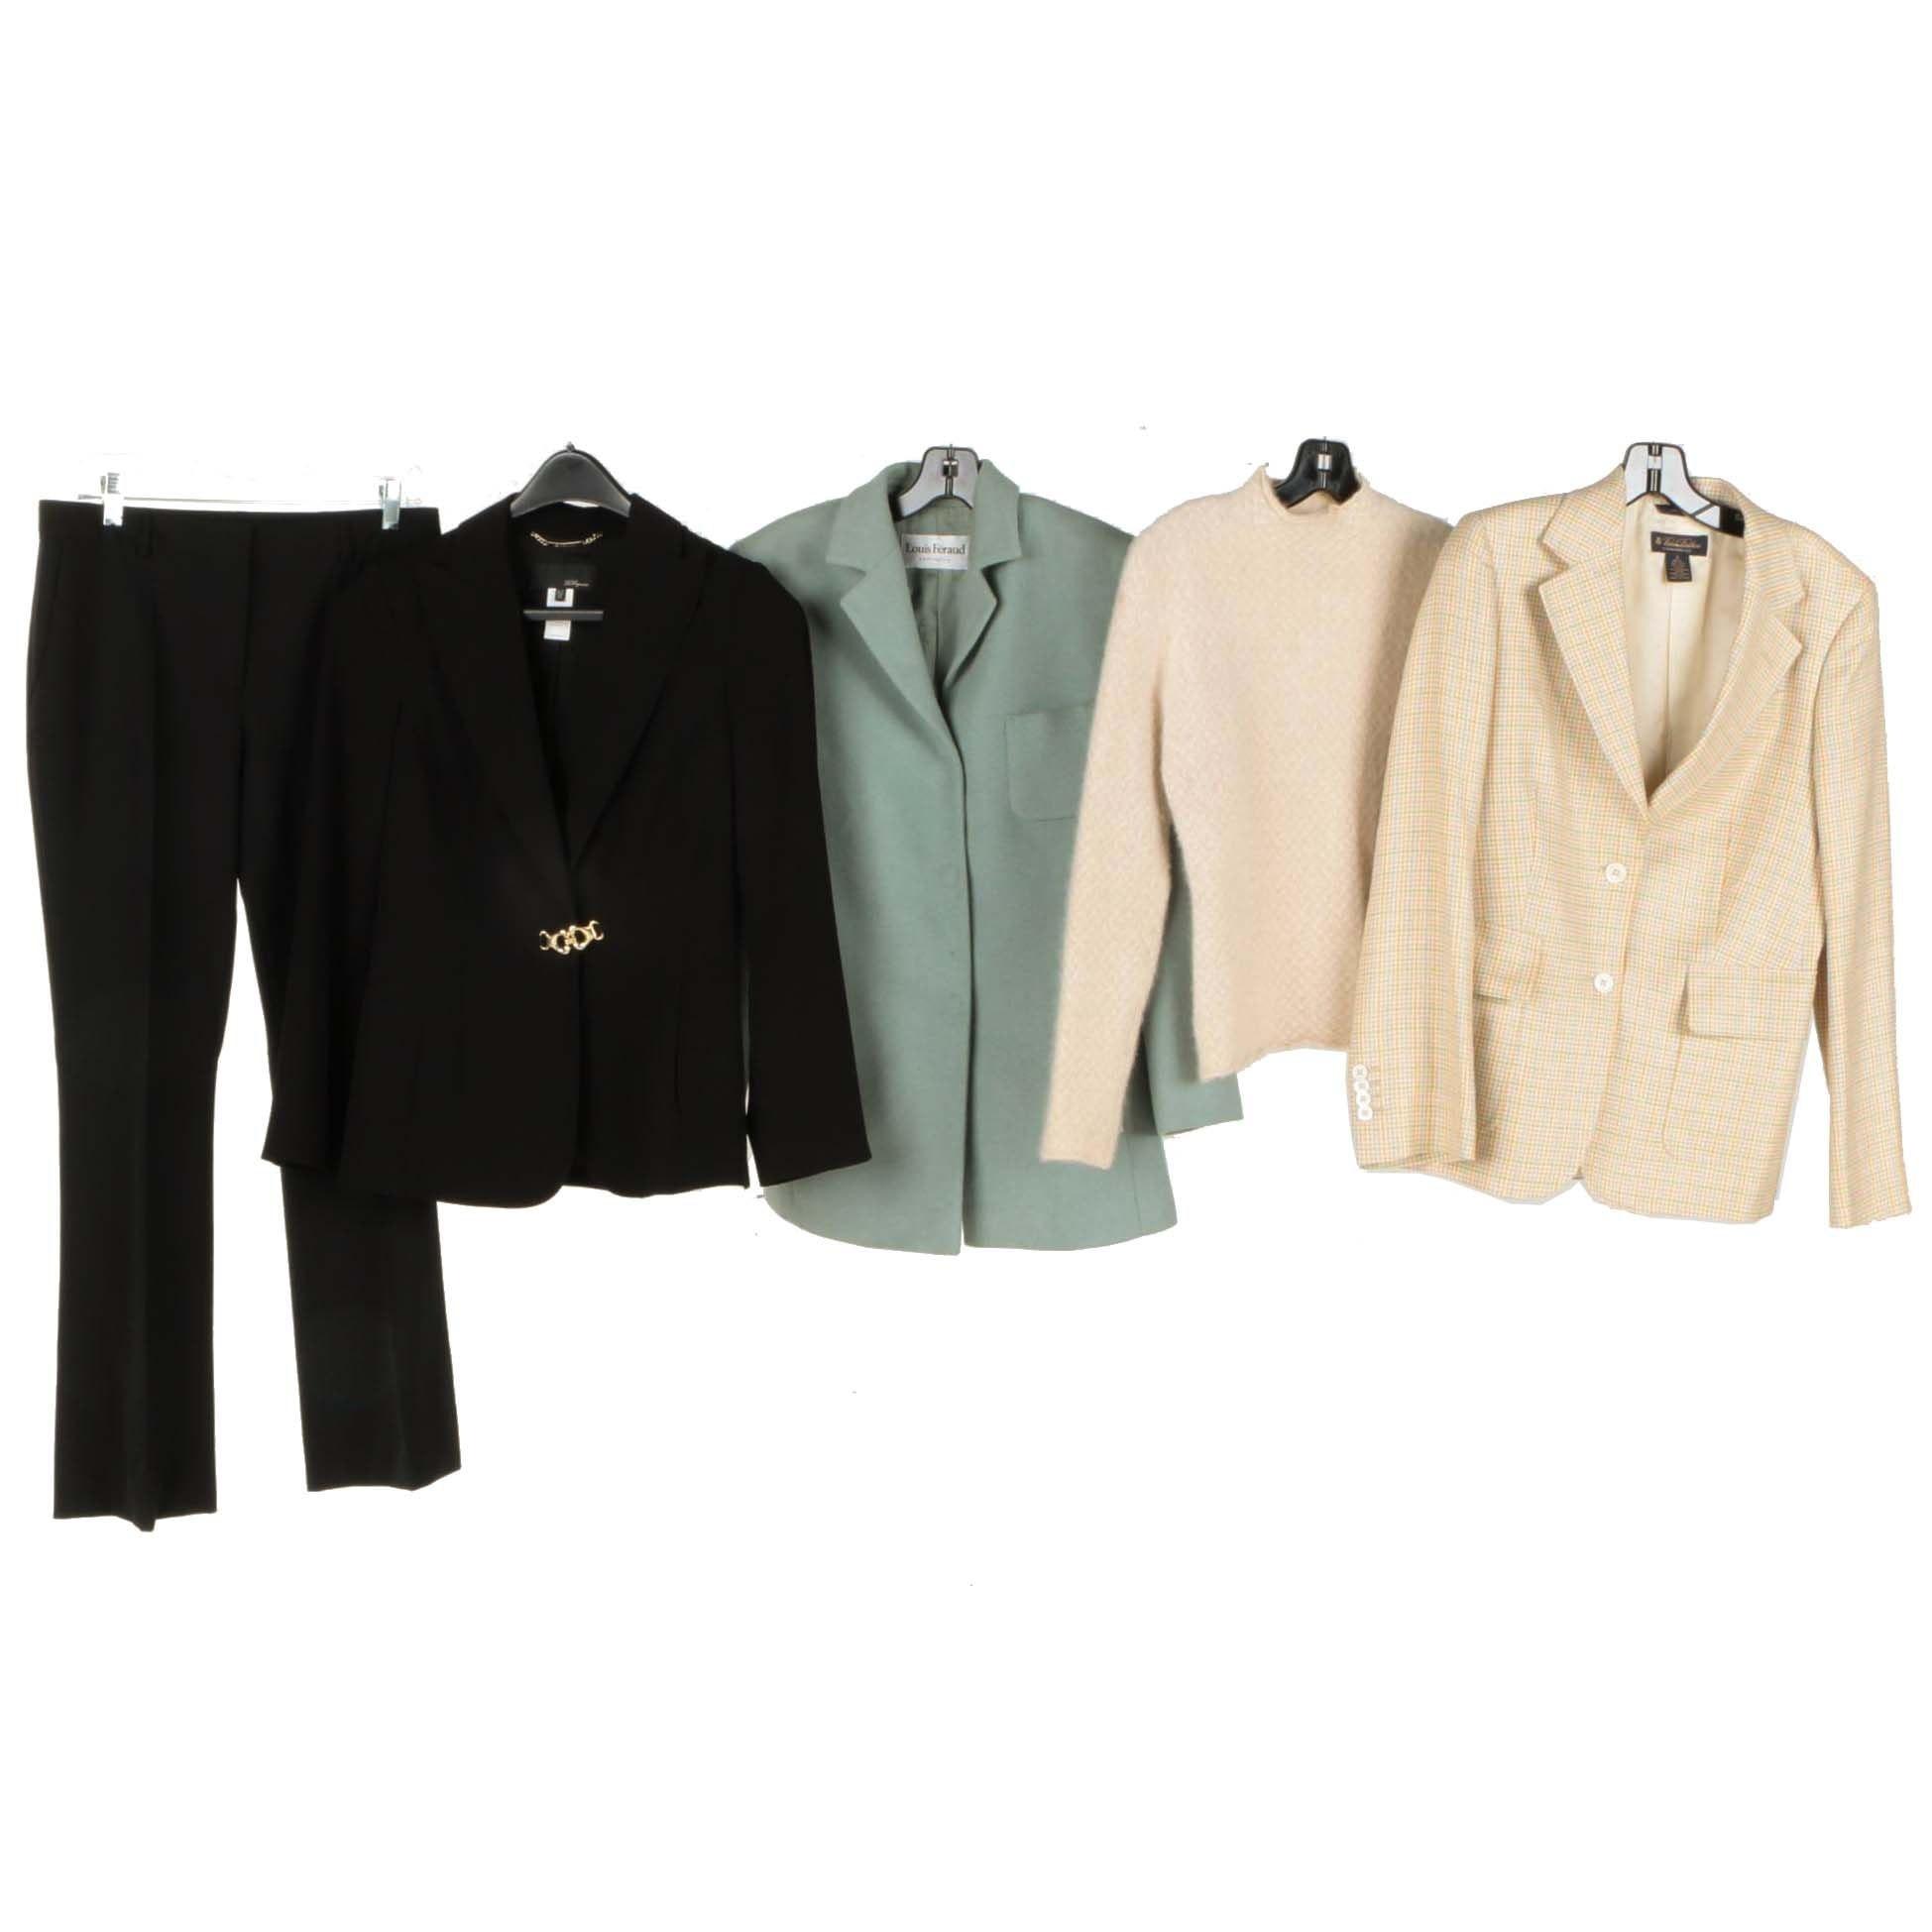 Women's Clothing Including a Louis Feraud Blazer and Vionnet Dress Pants